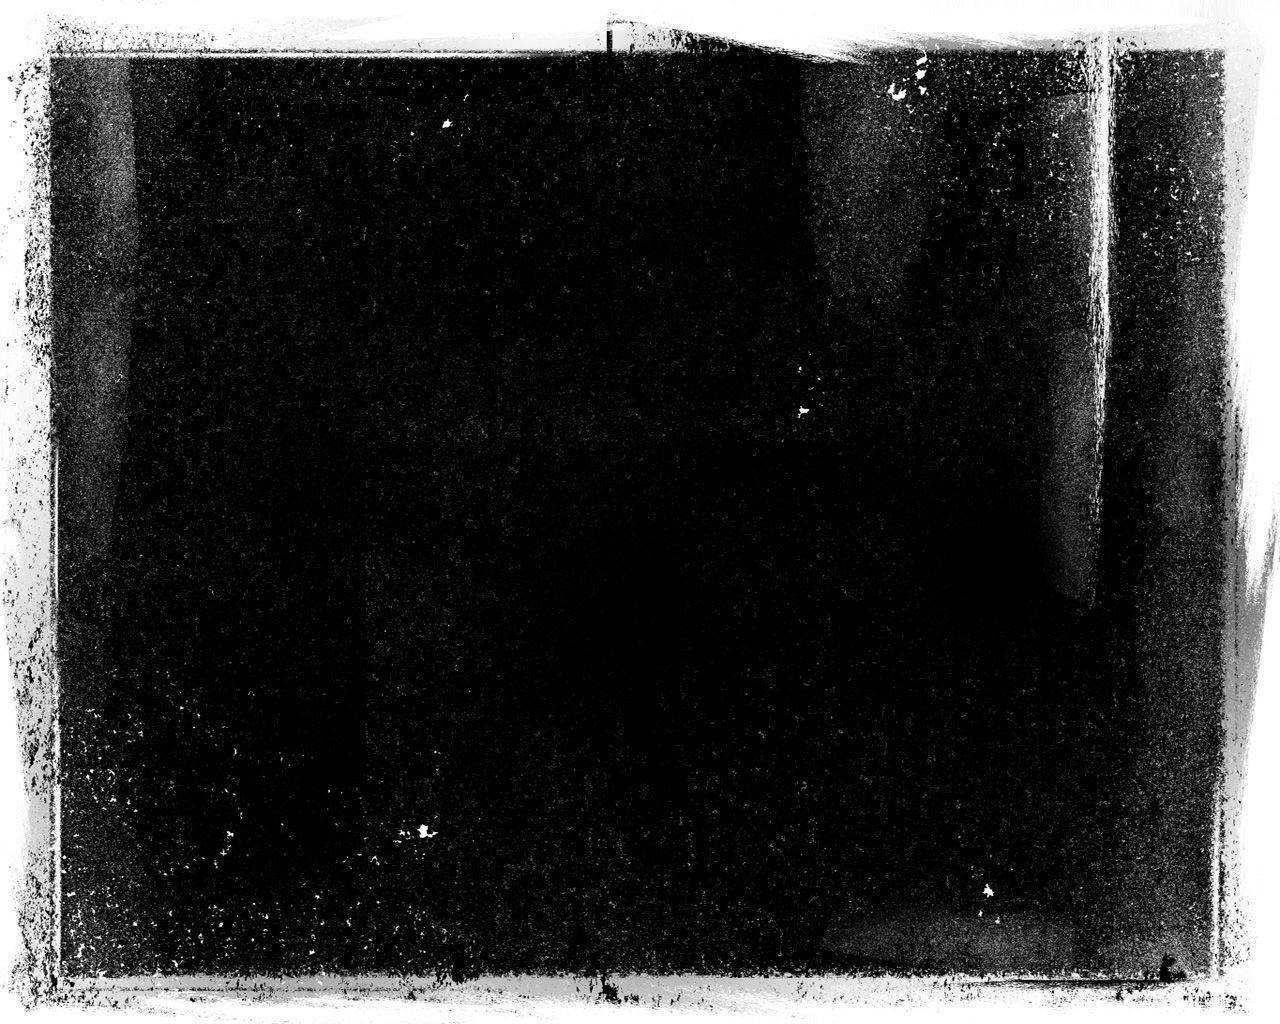 Black grunge Background PPT Background di 2020 Latar